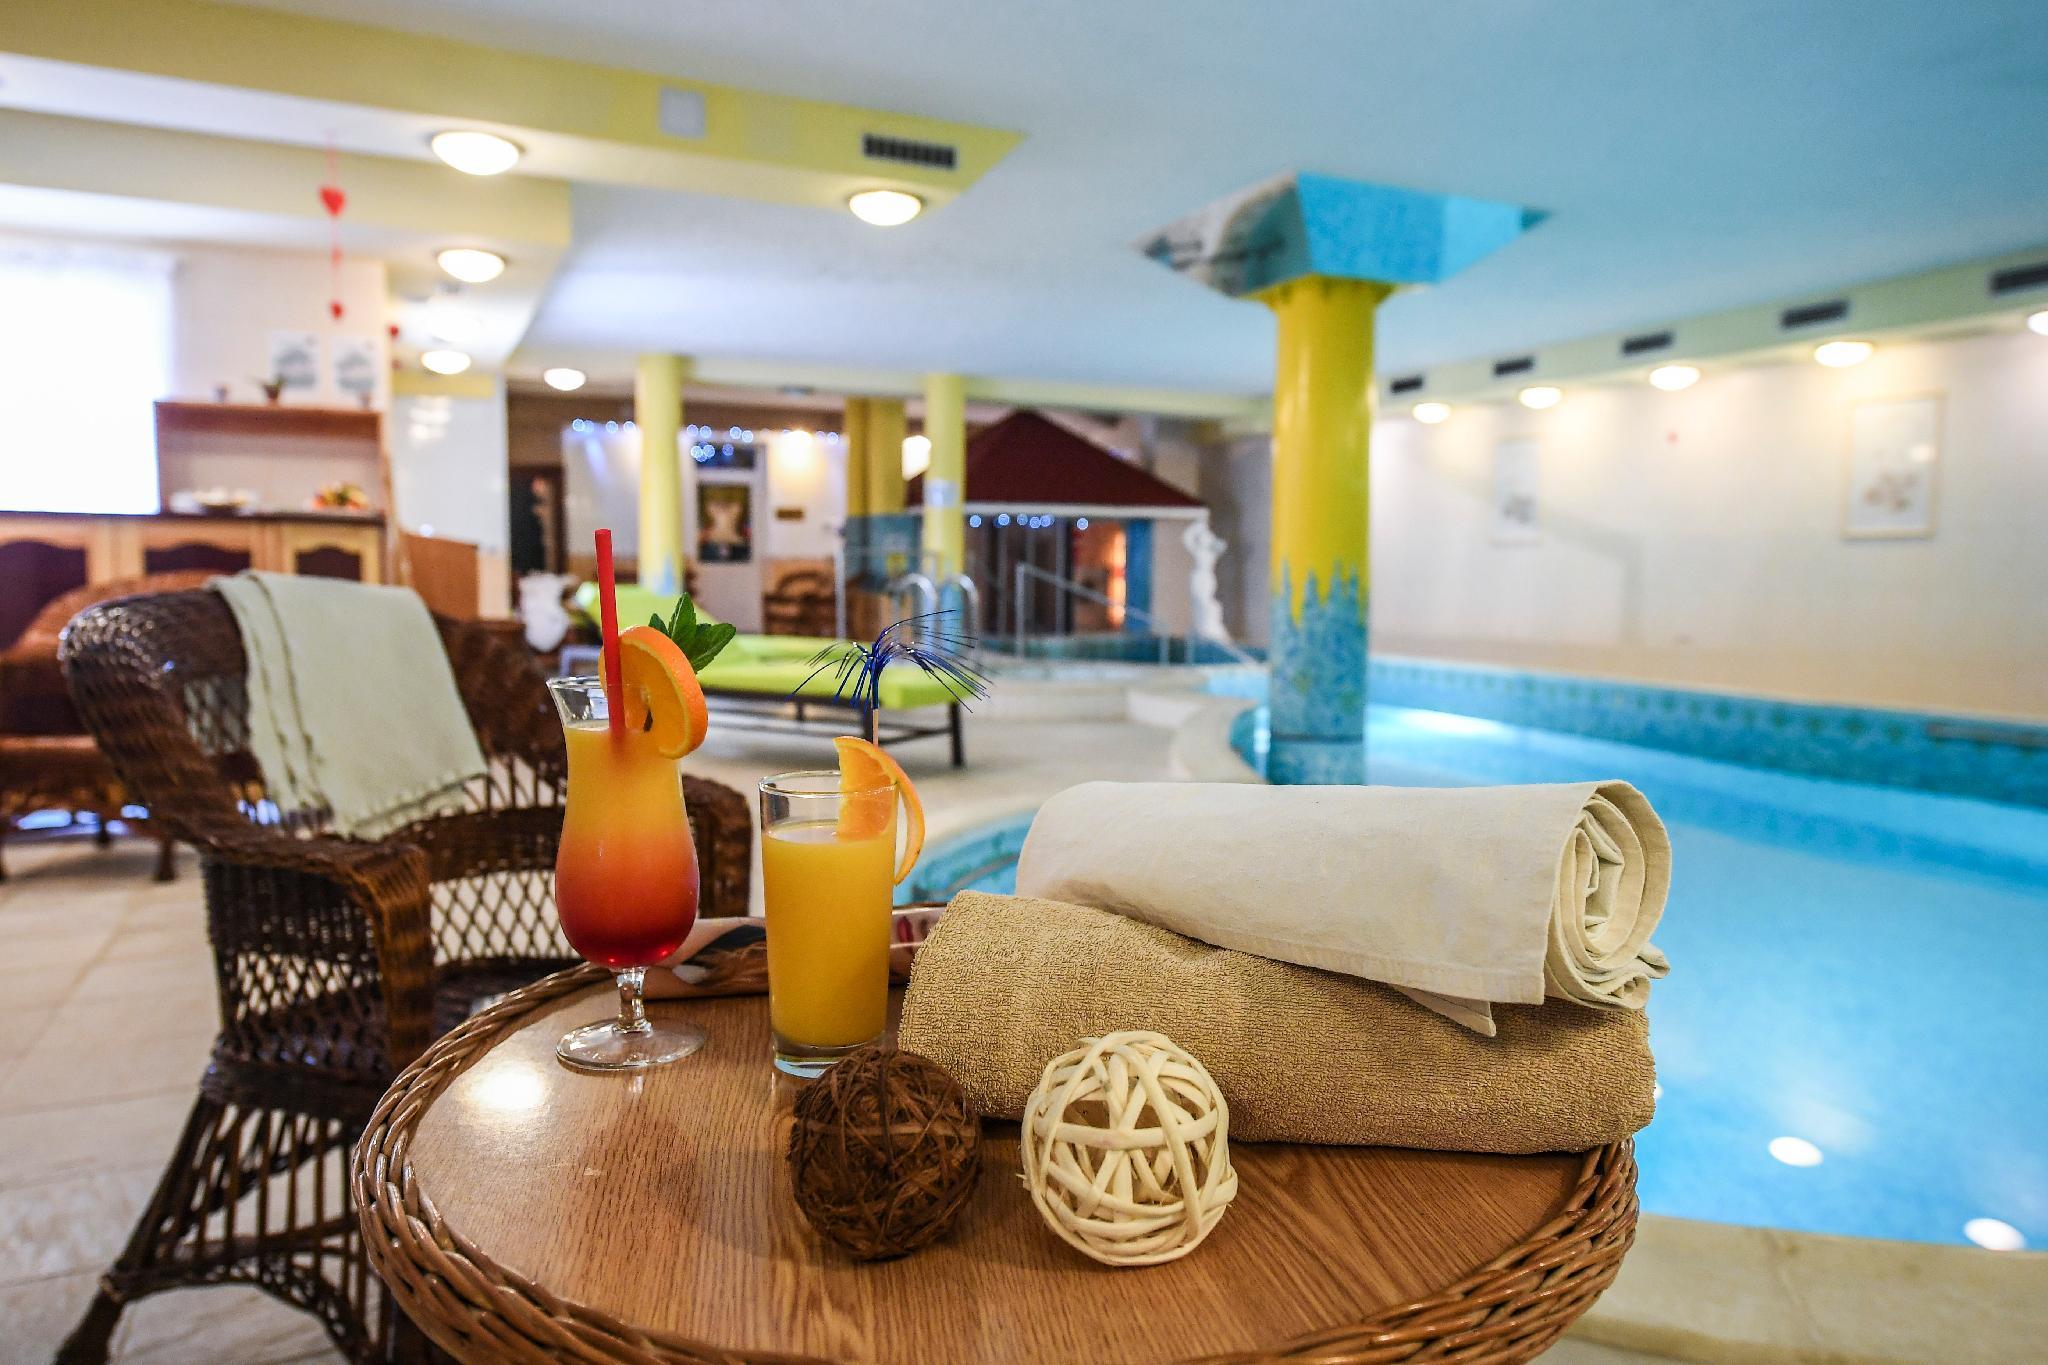 Hotel Korona Eger Wellness and Conference Hotel, Eger